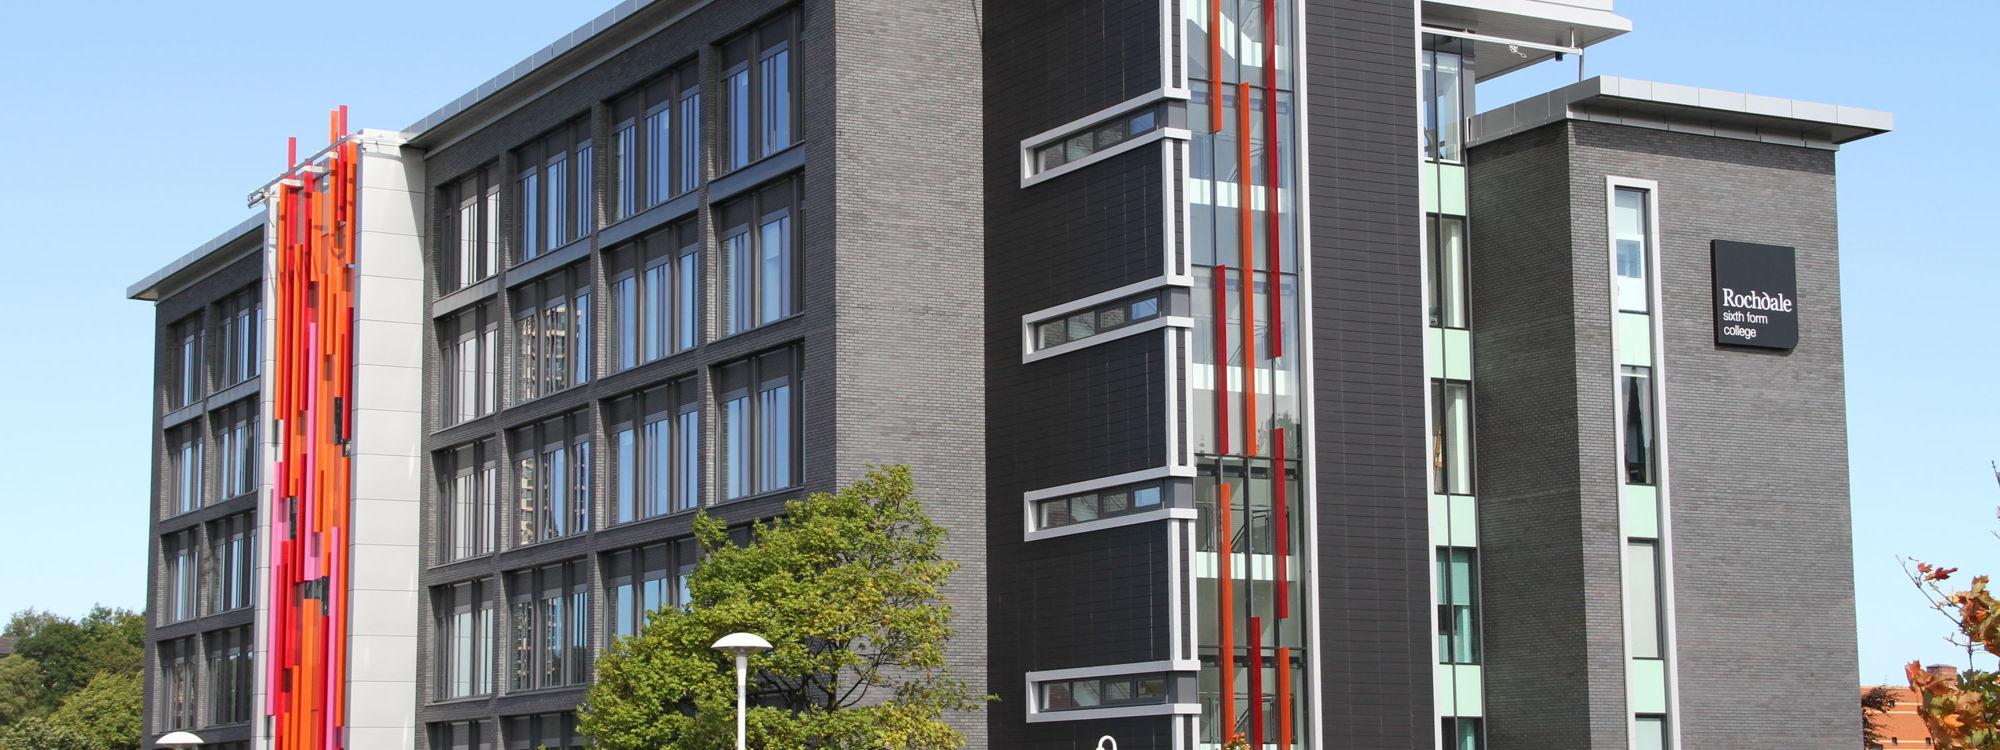 RSFC building